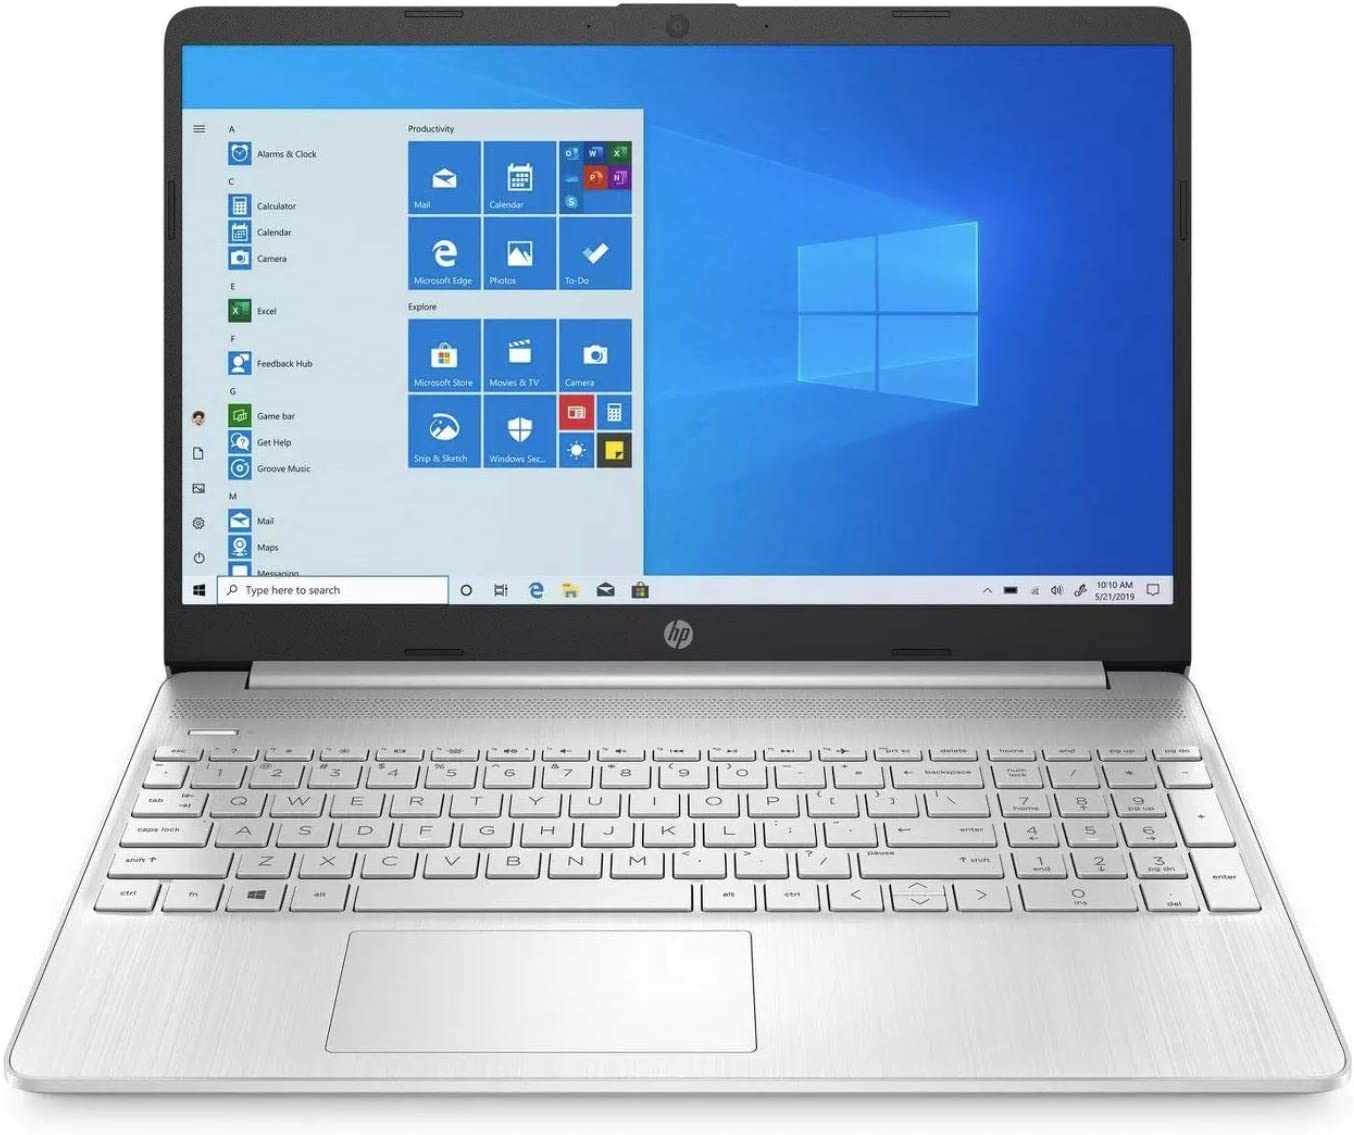 HP Premium 15-Inch HD 256GB SSD 2.4GHz AMD Athlon Gold Processor Non Touch Laptop (4GB RAM, AMD Radeon Graphics, Webcam, USB-C, HDMI, SD Card Reader, Windows 10 Home S) Natural Silver, 15-ef1040nr